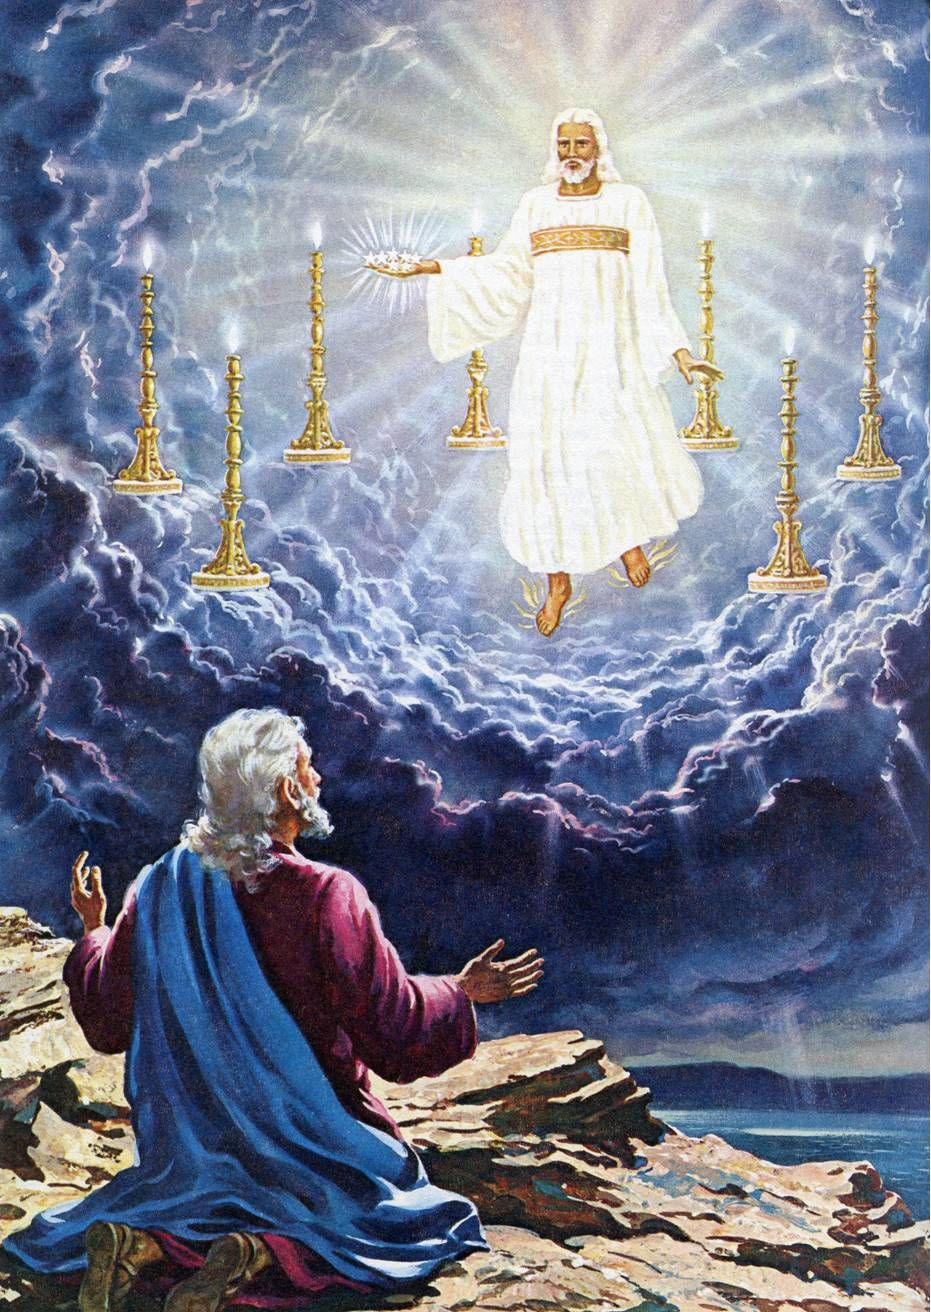 Pin on Revelation (Bible)